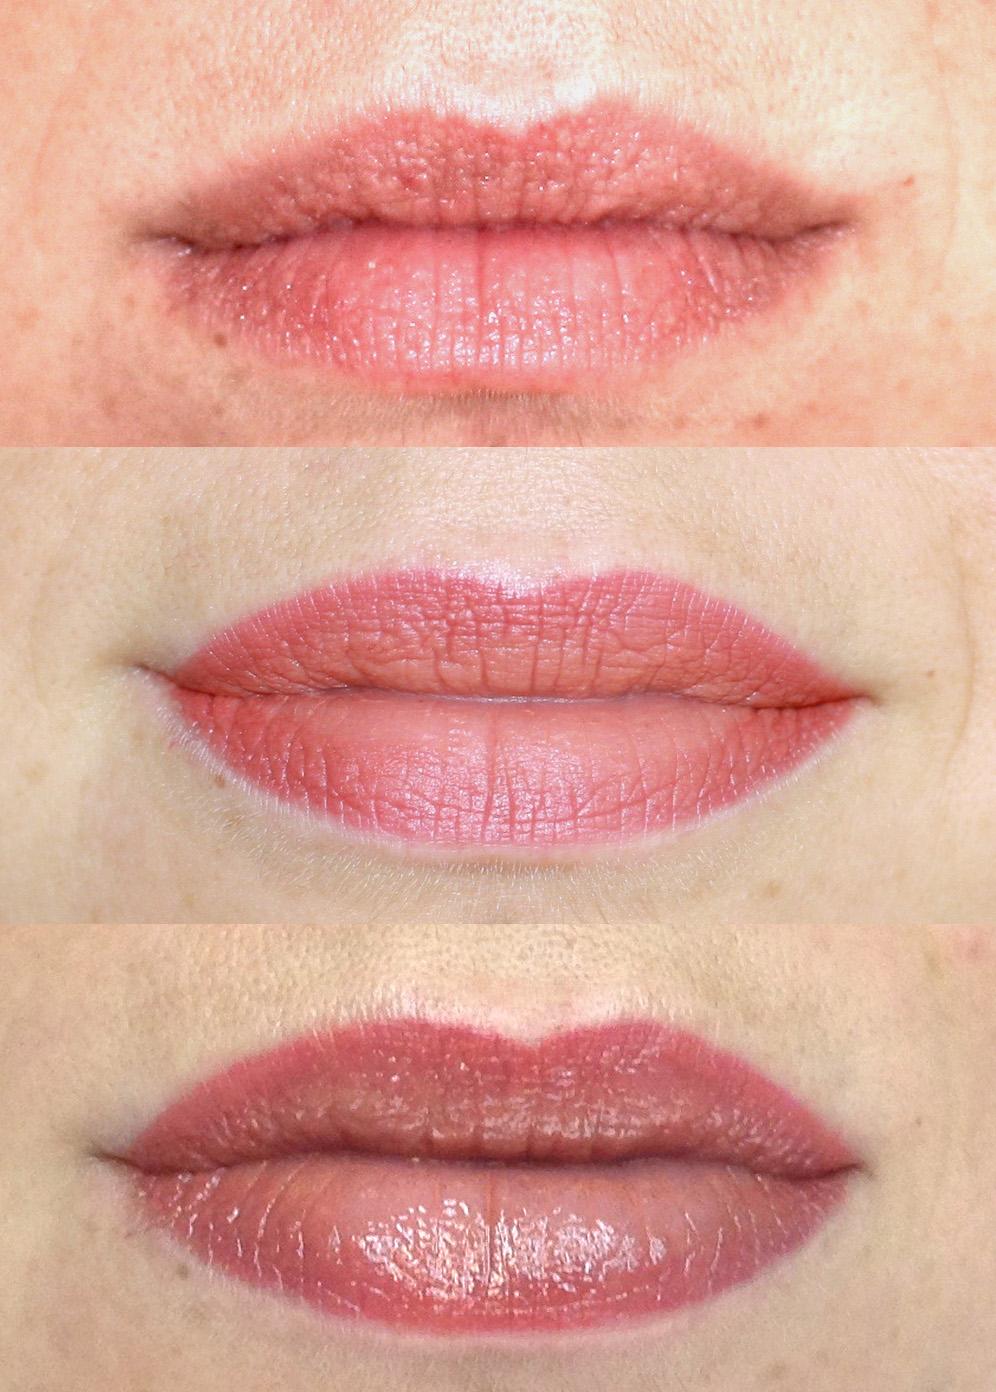 photo-gallery-lips